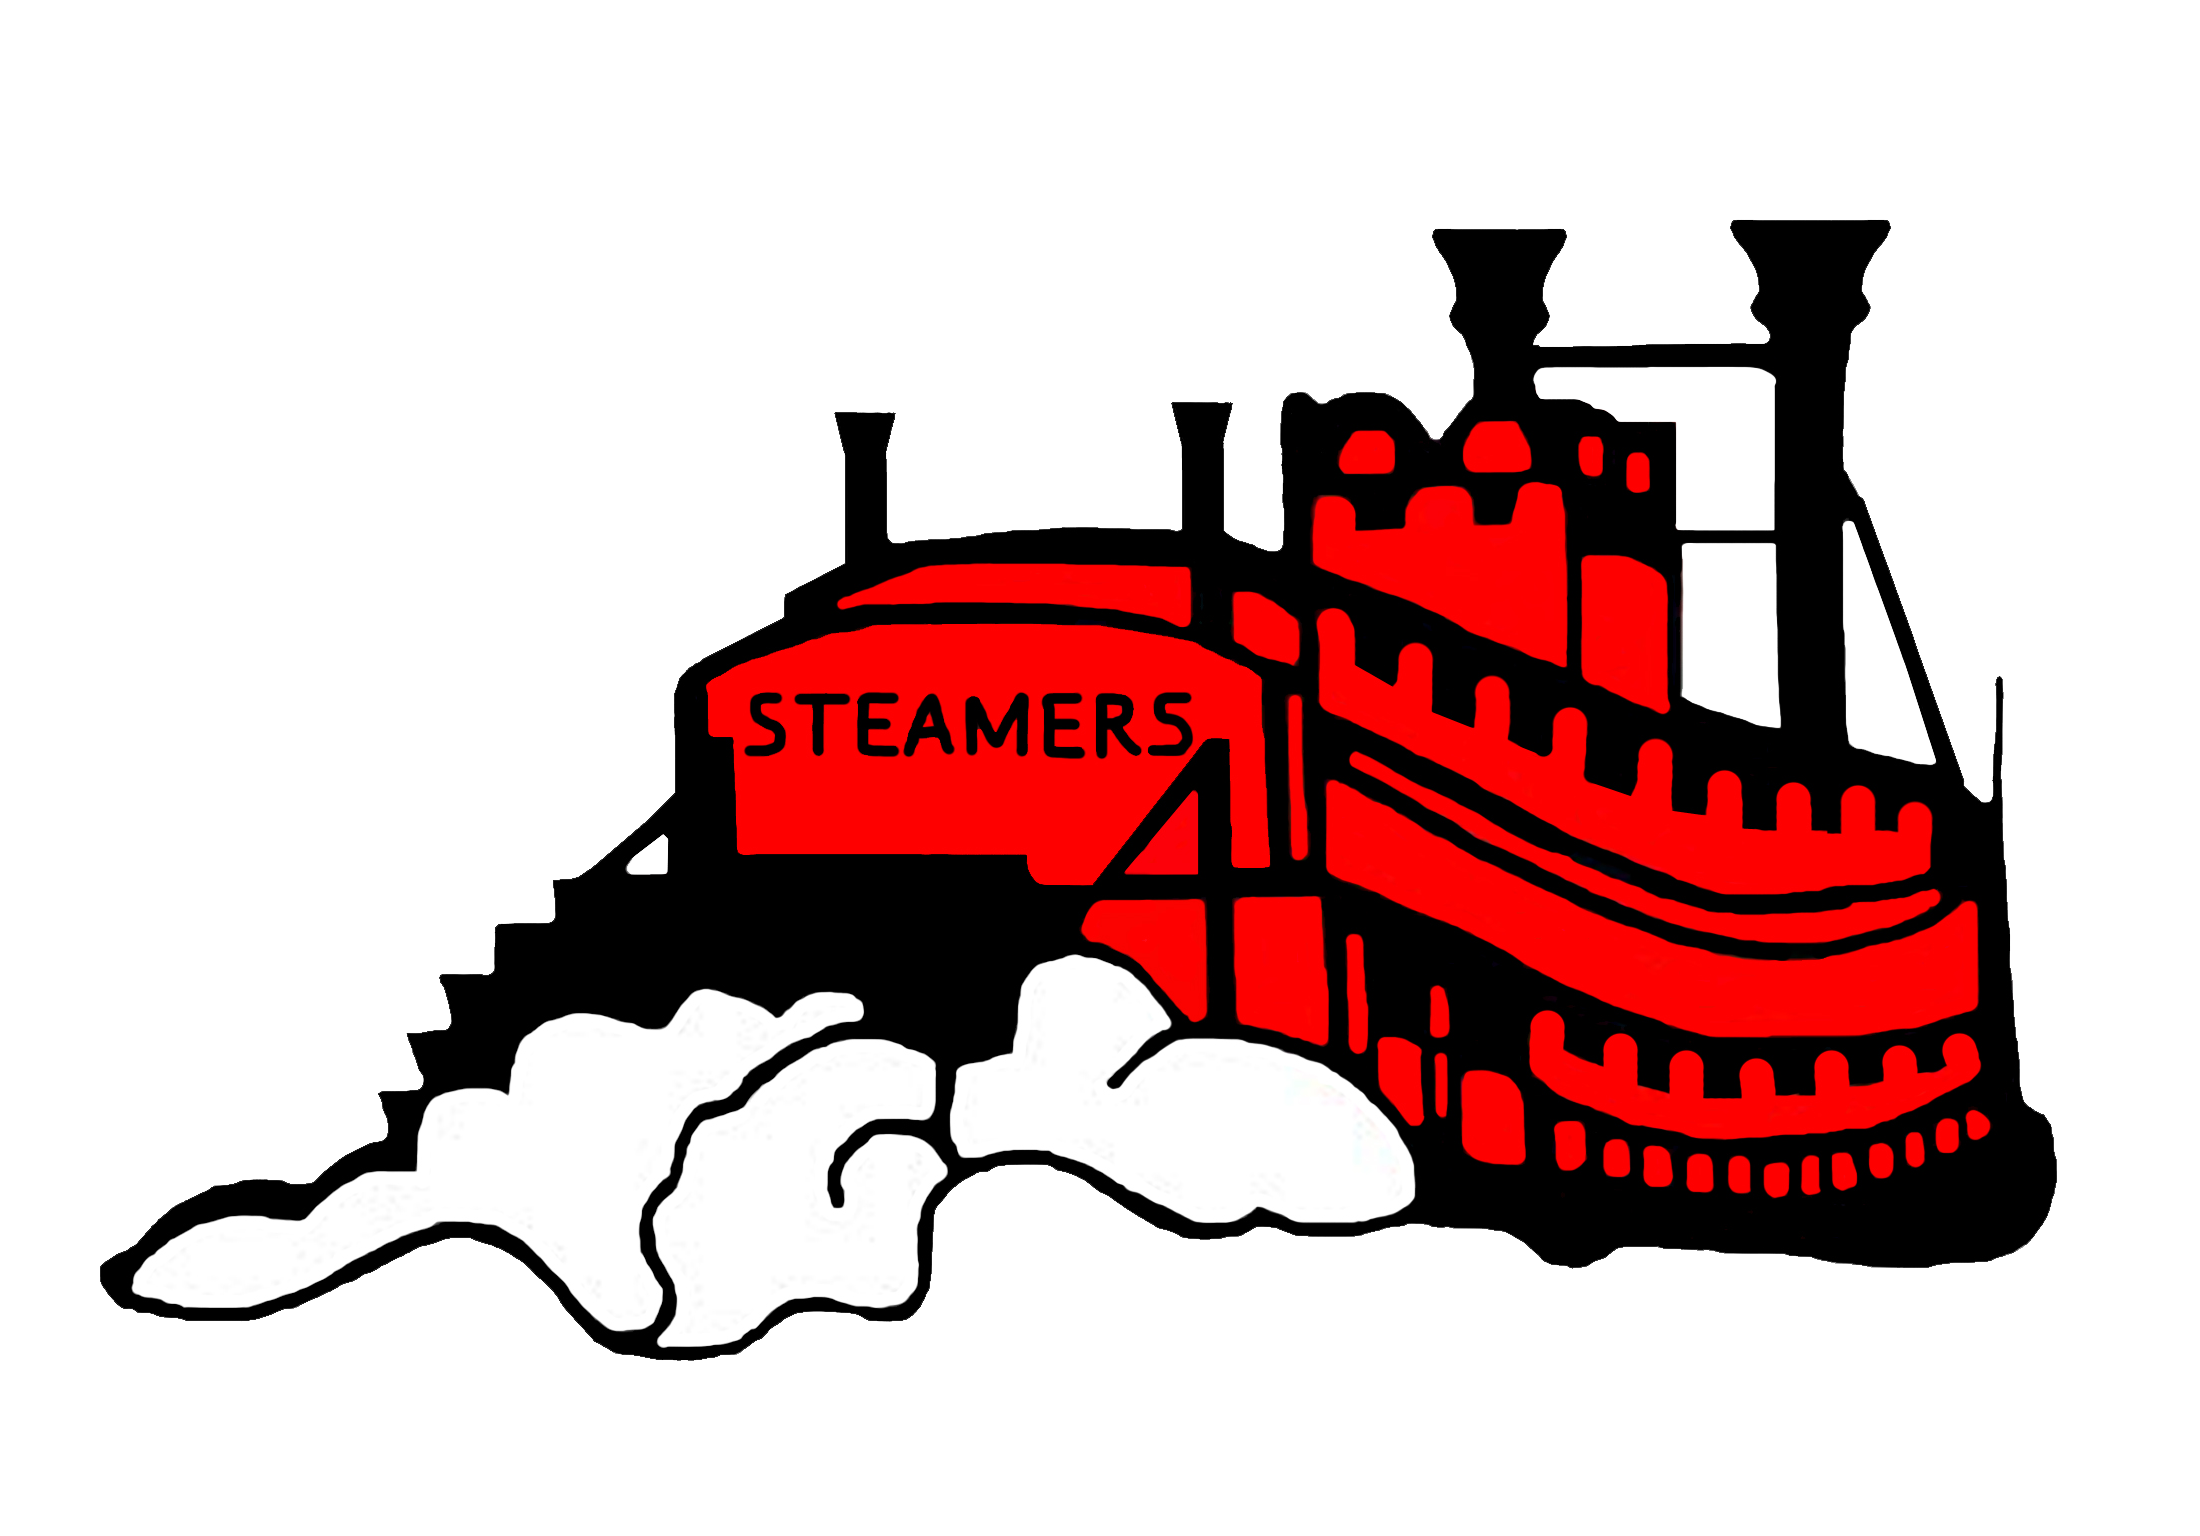 Athletics fulton high school. Streamers clipart steamer